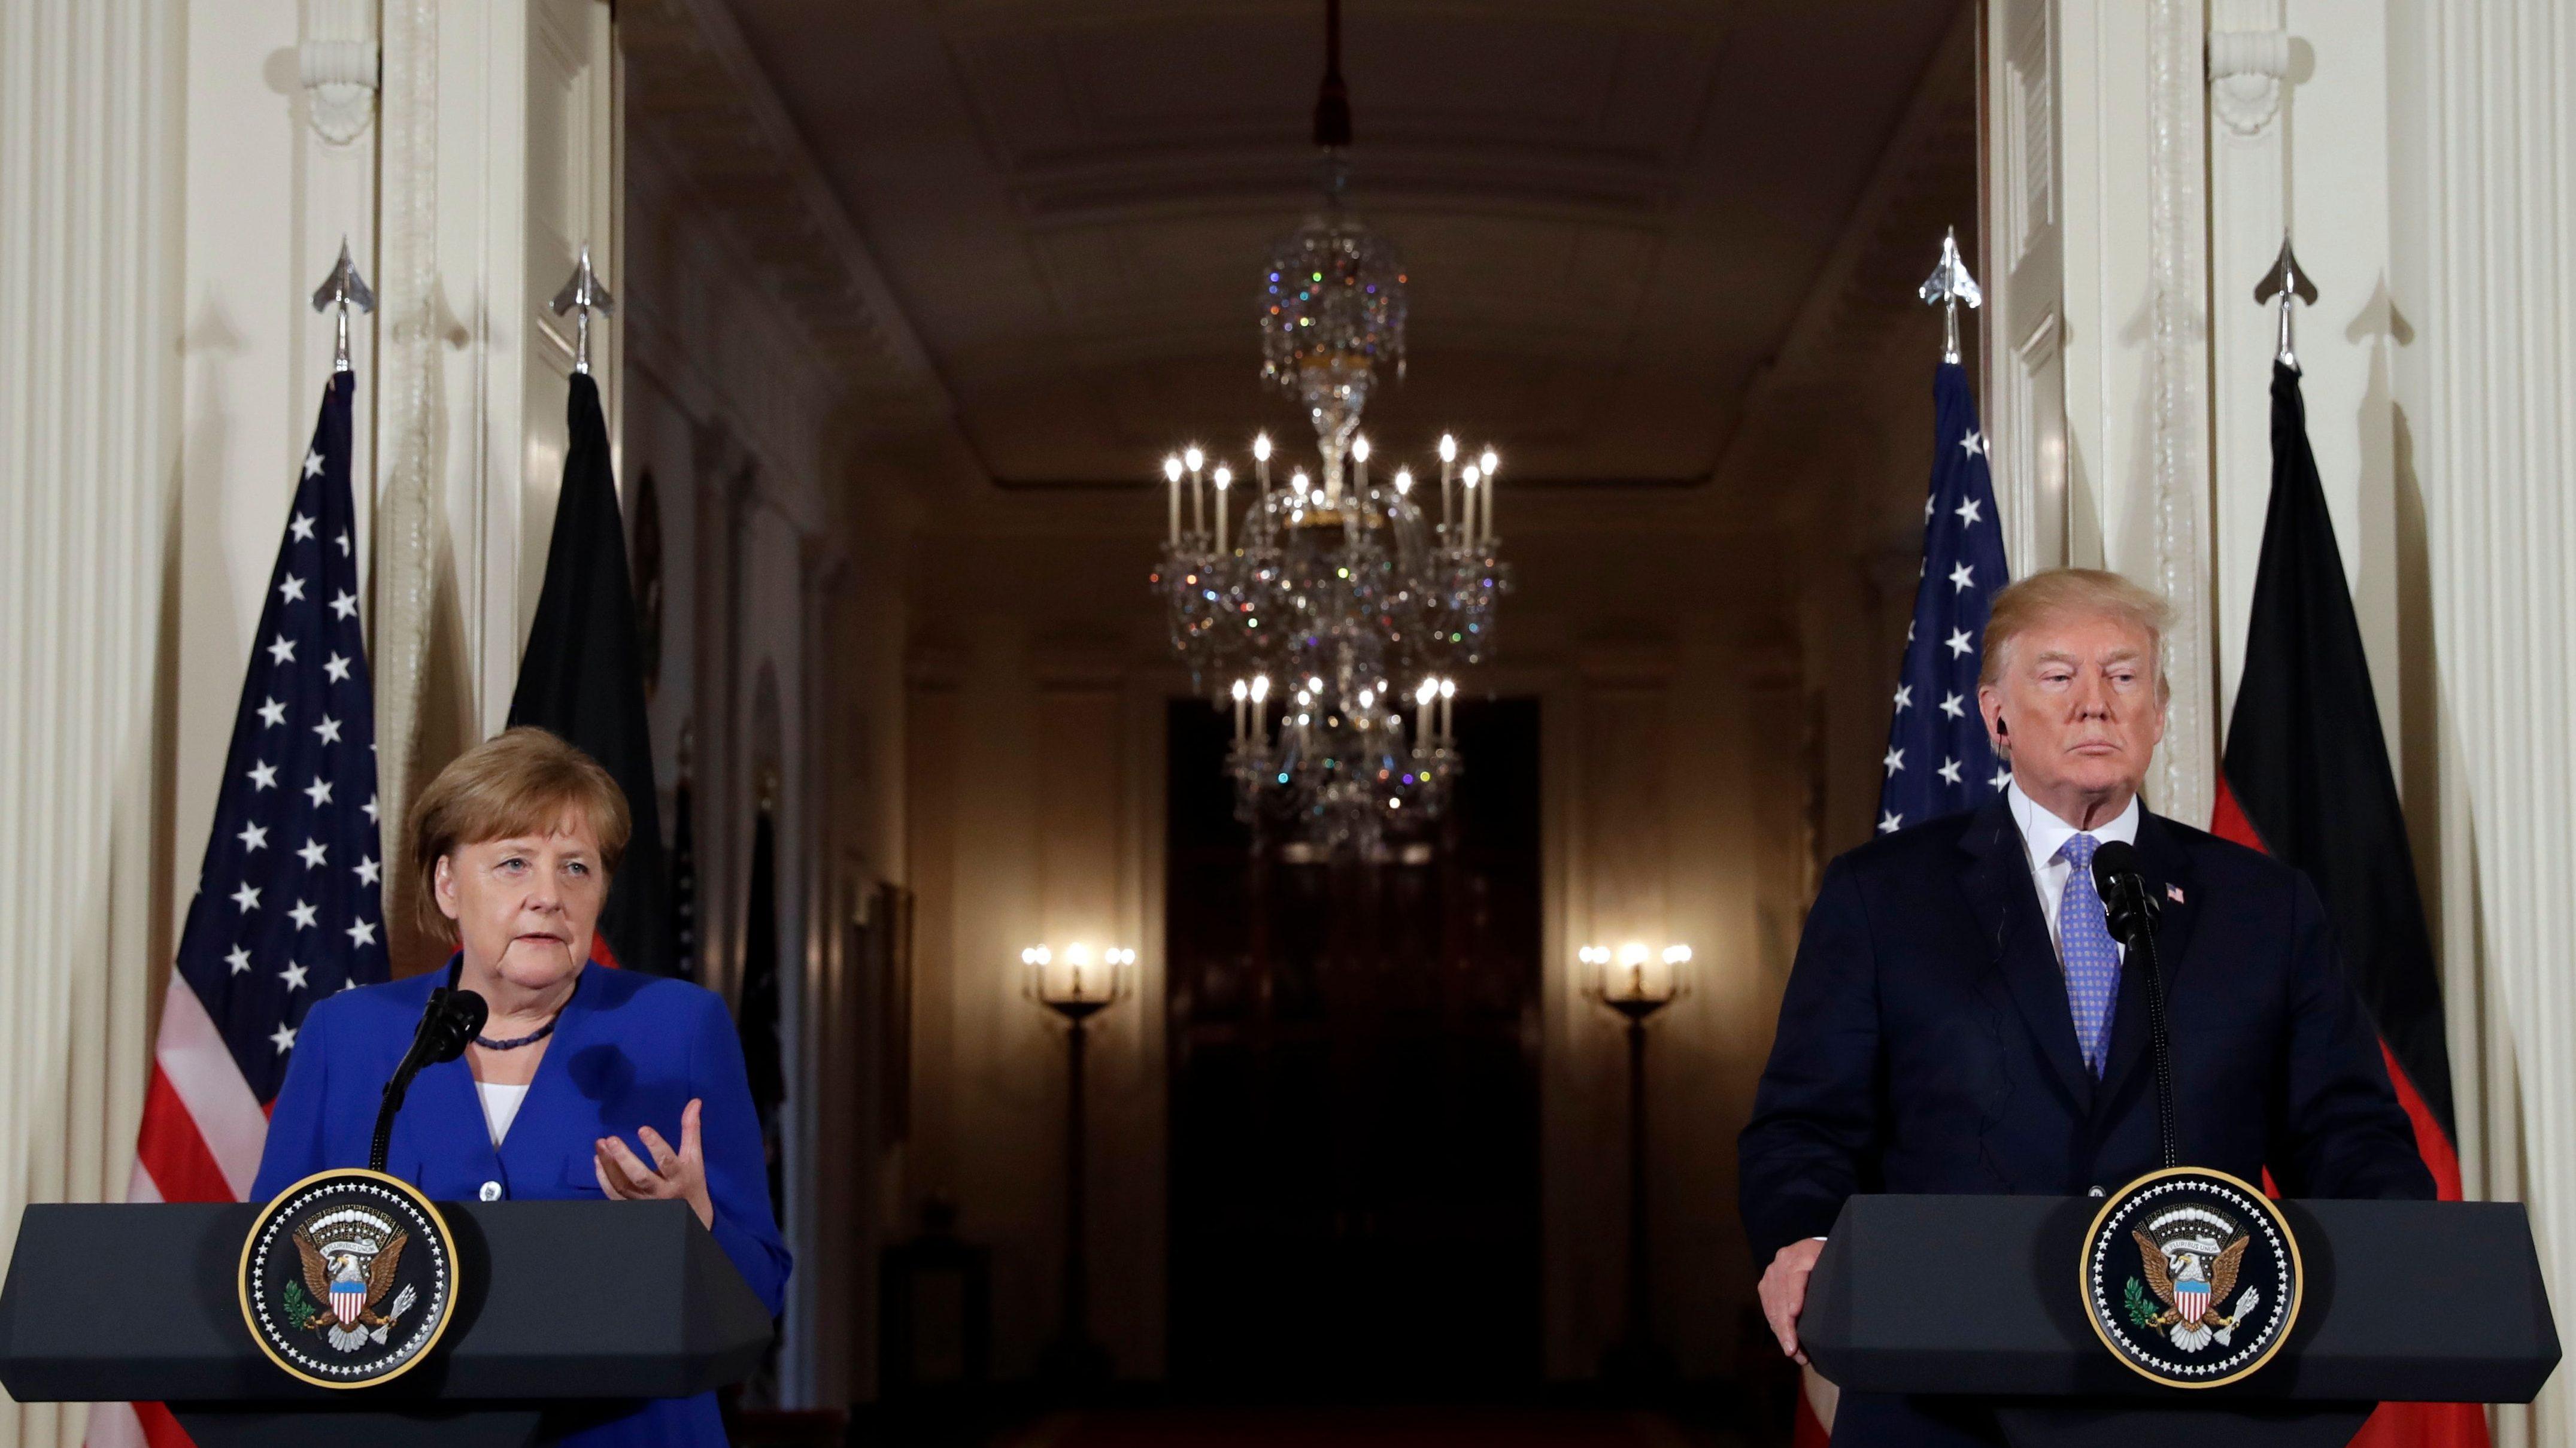 Donald Trump with Angela Merkel